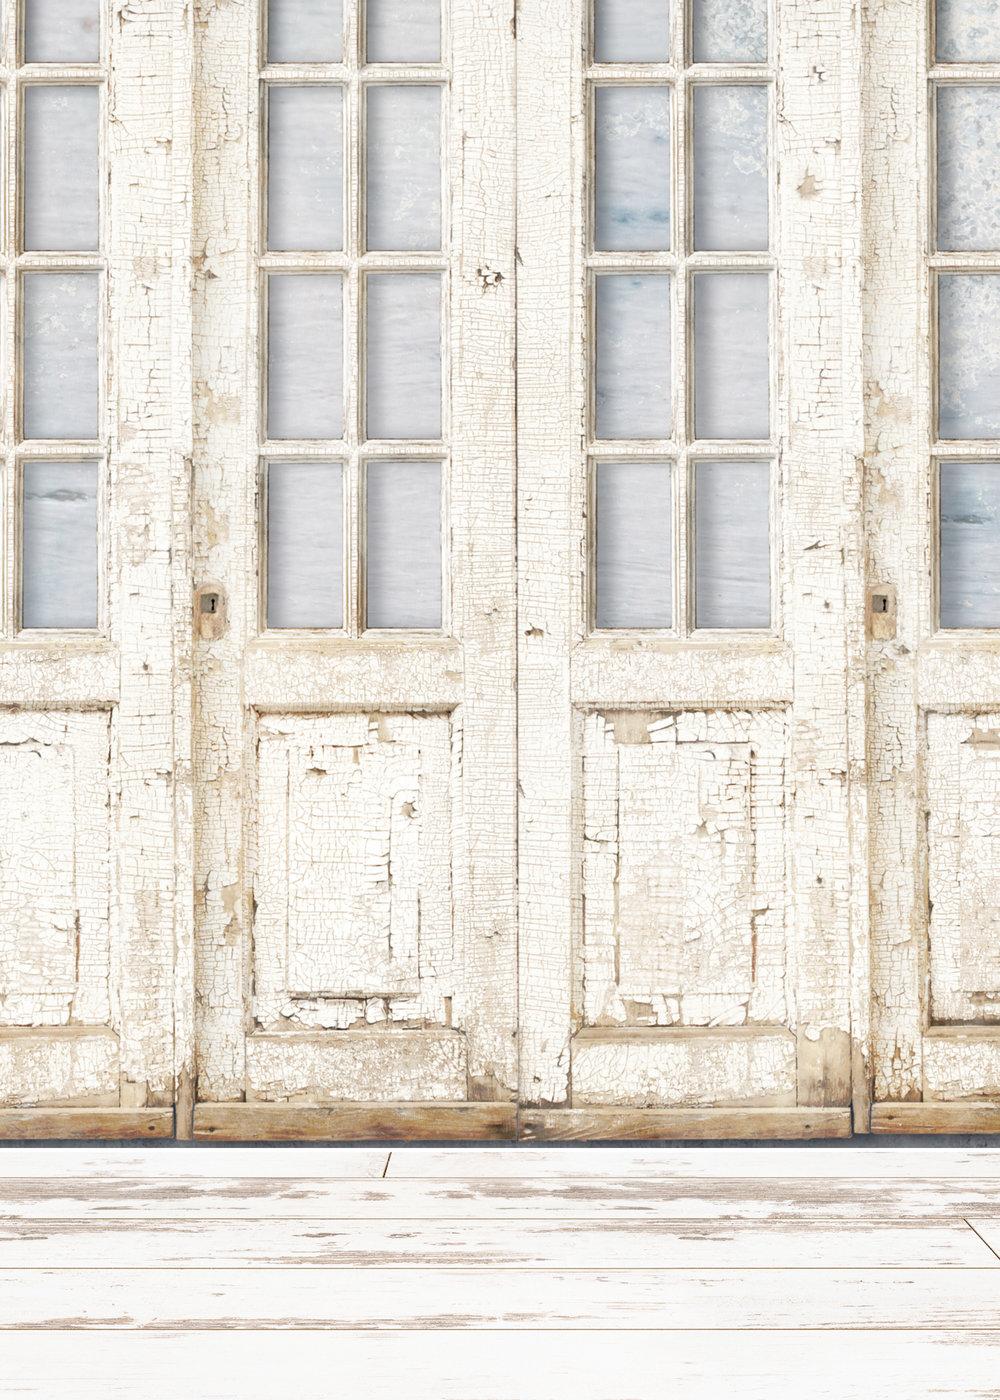 Background B - Antique Doors